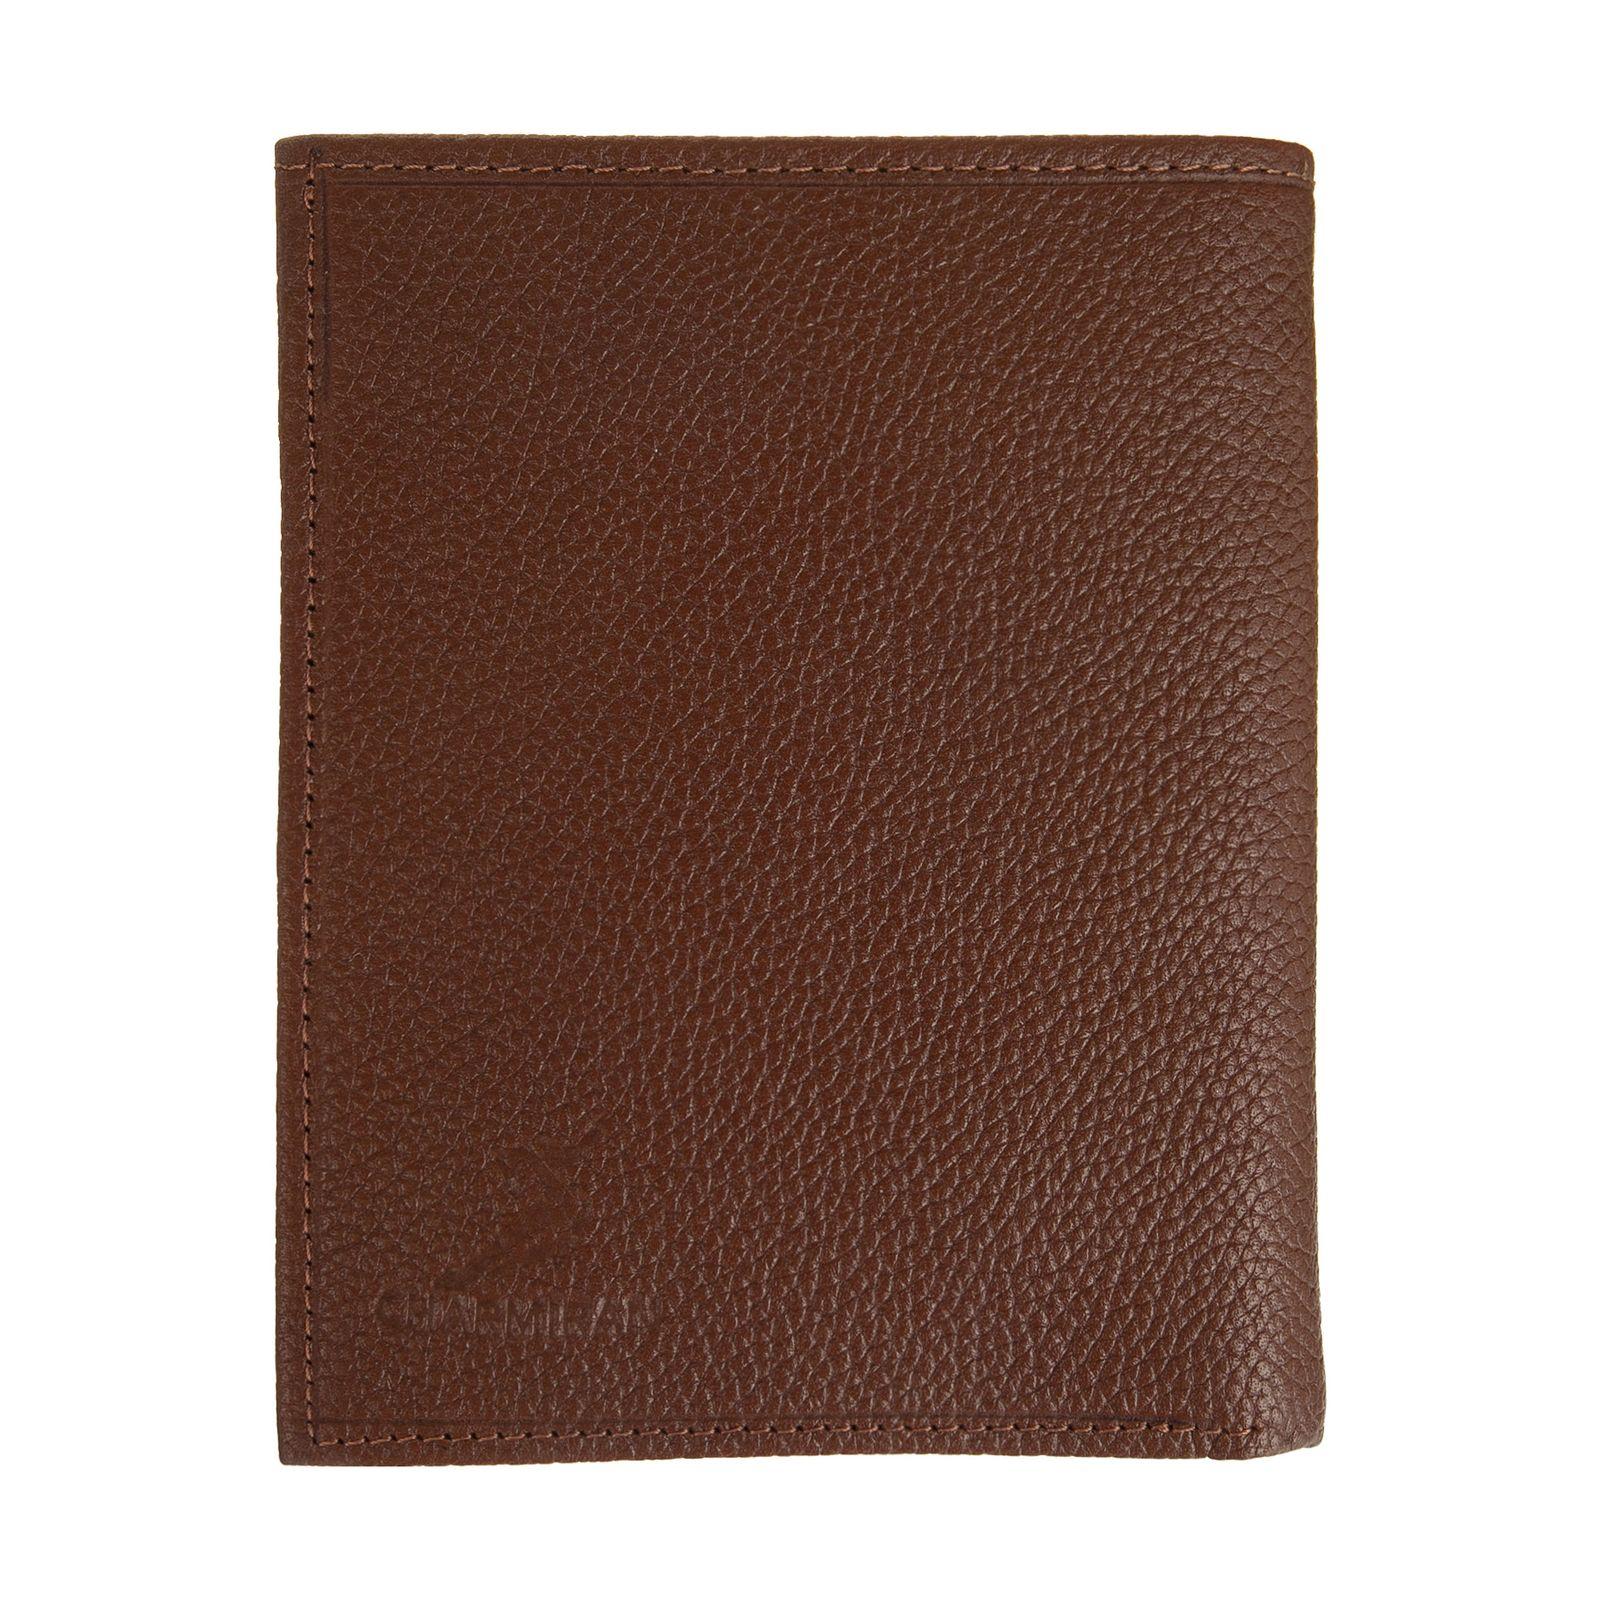 کیف پول مردانه چرمیران مدل 6057104 -  - 2